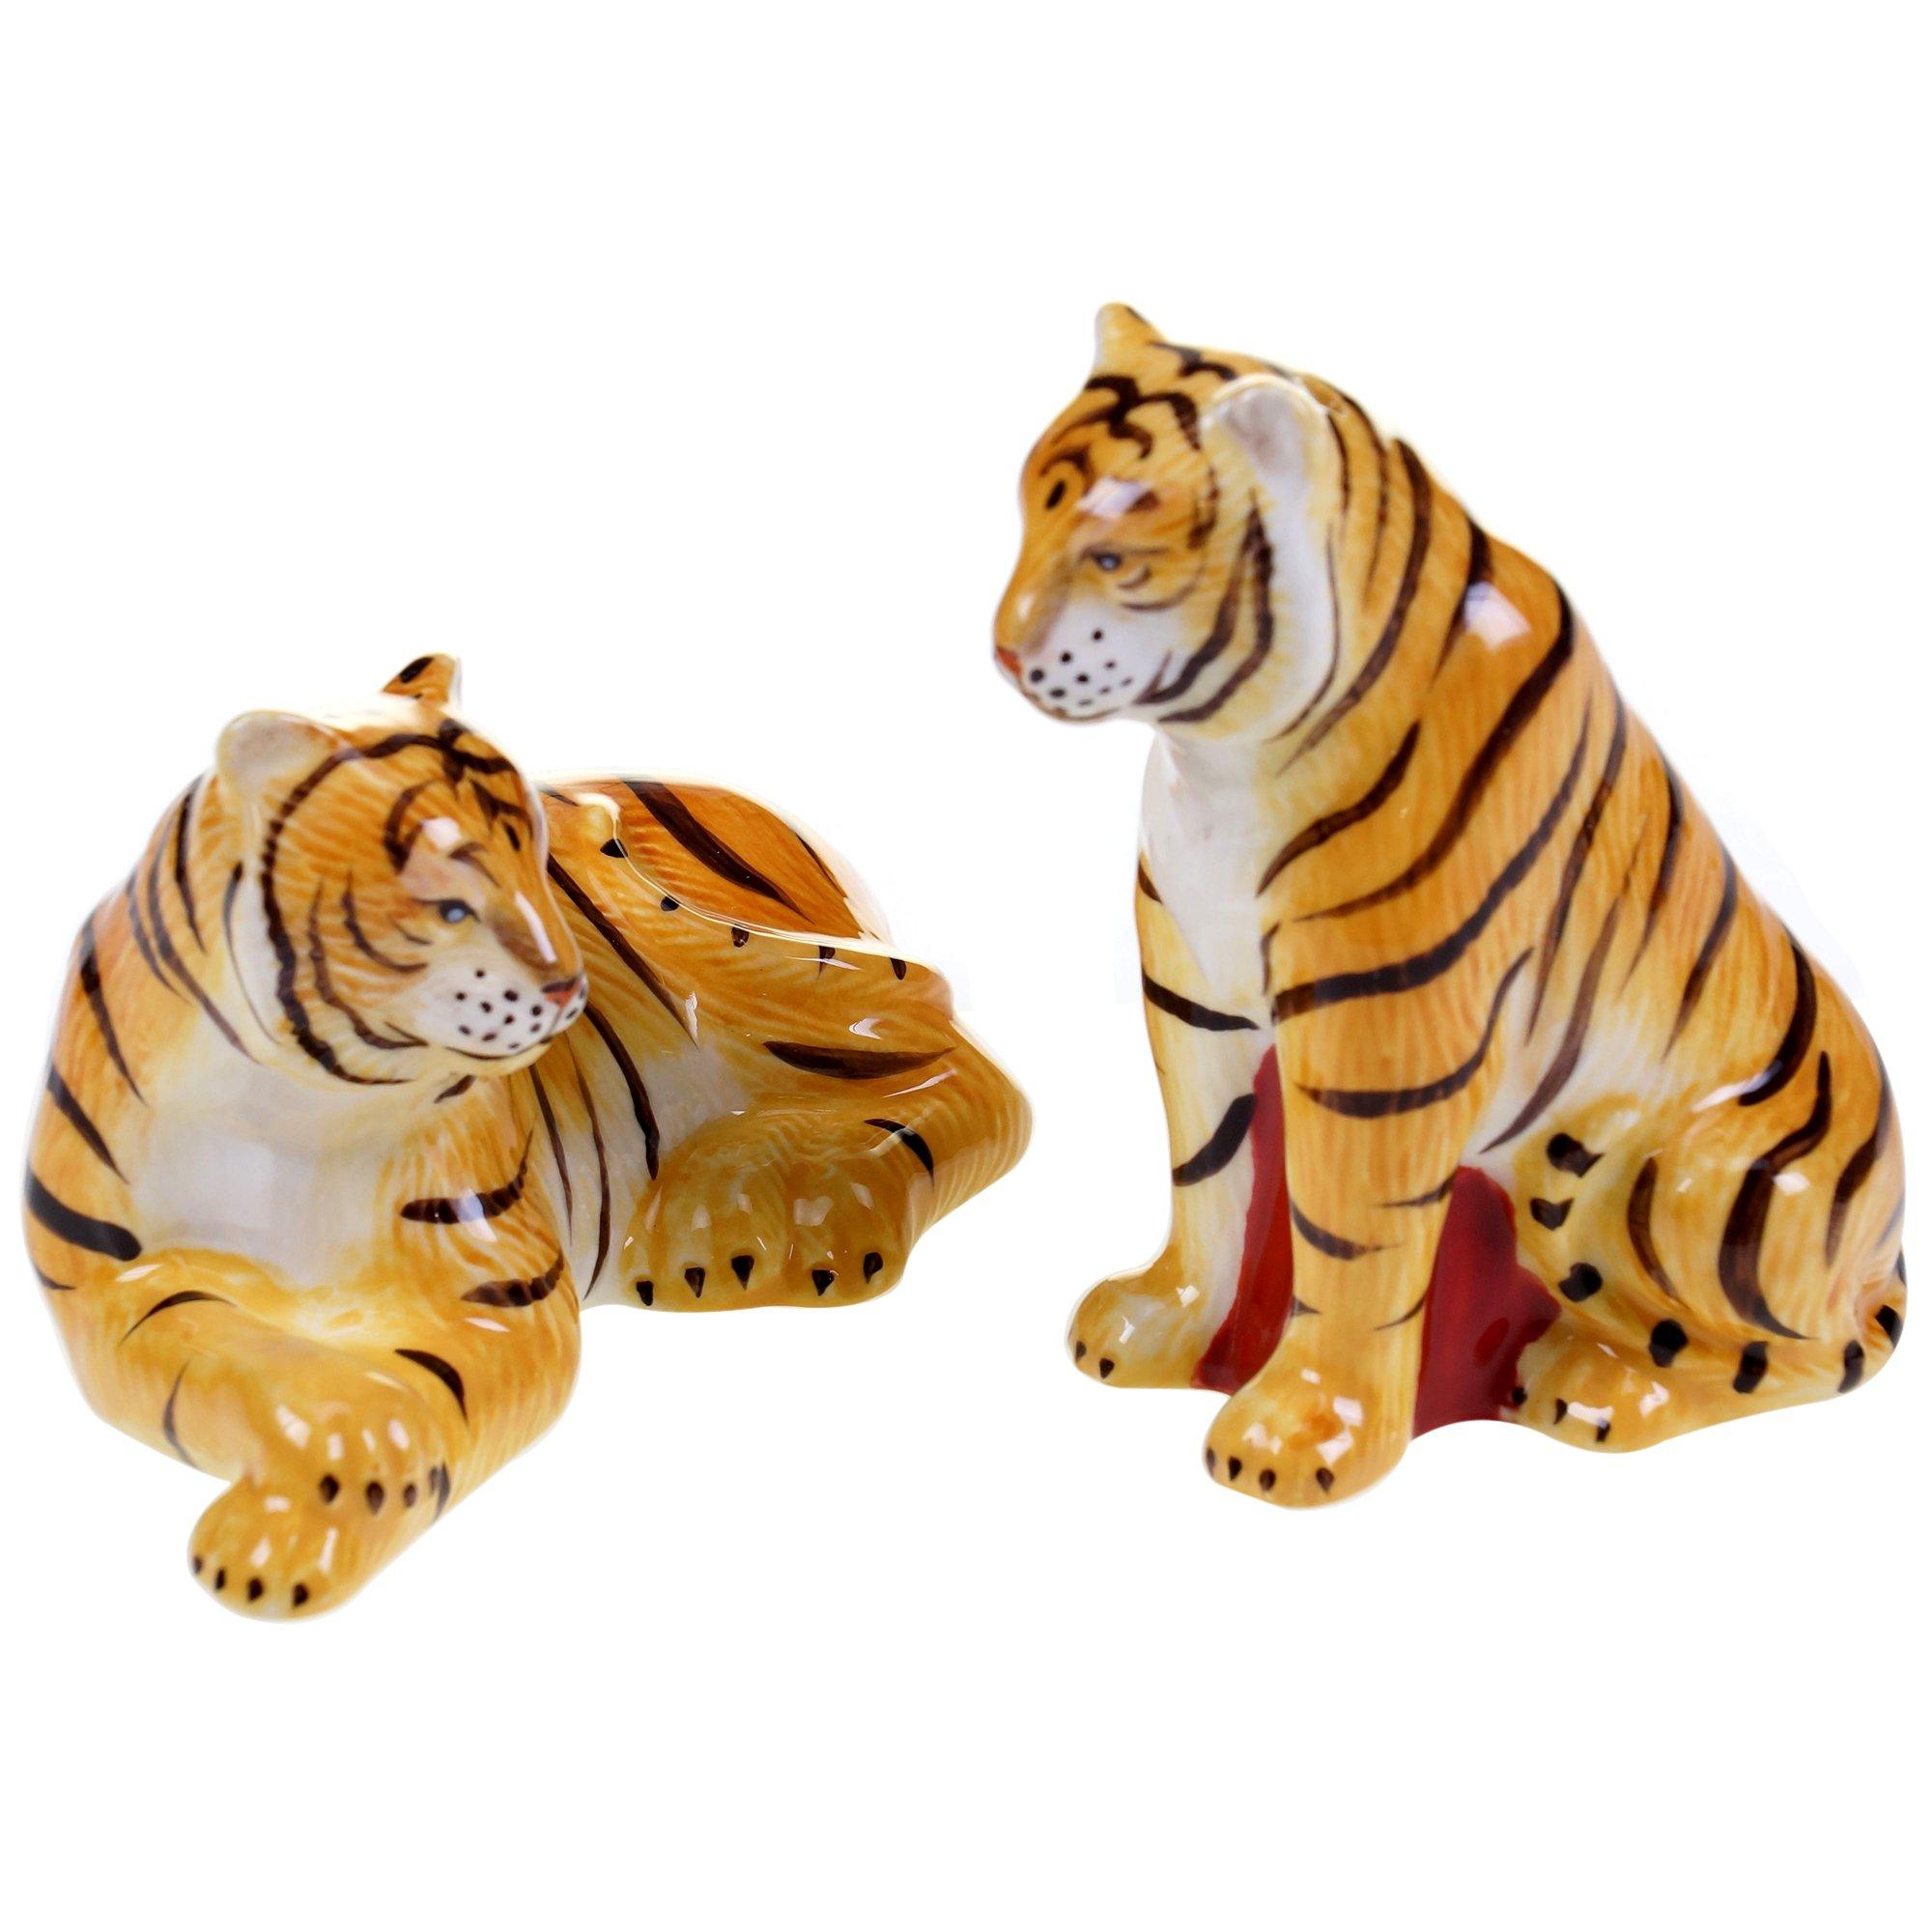 Tracy Porter for Poetic Wanderlust Imperial Bengal 3-D Tiger Salt & Pepper Set